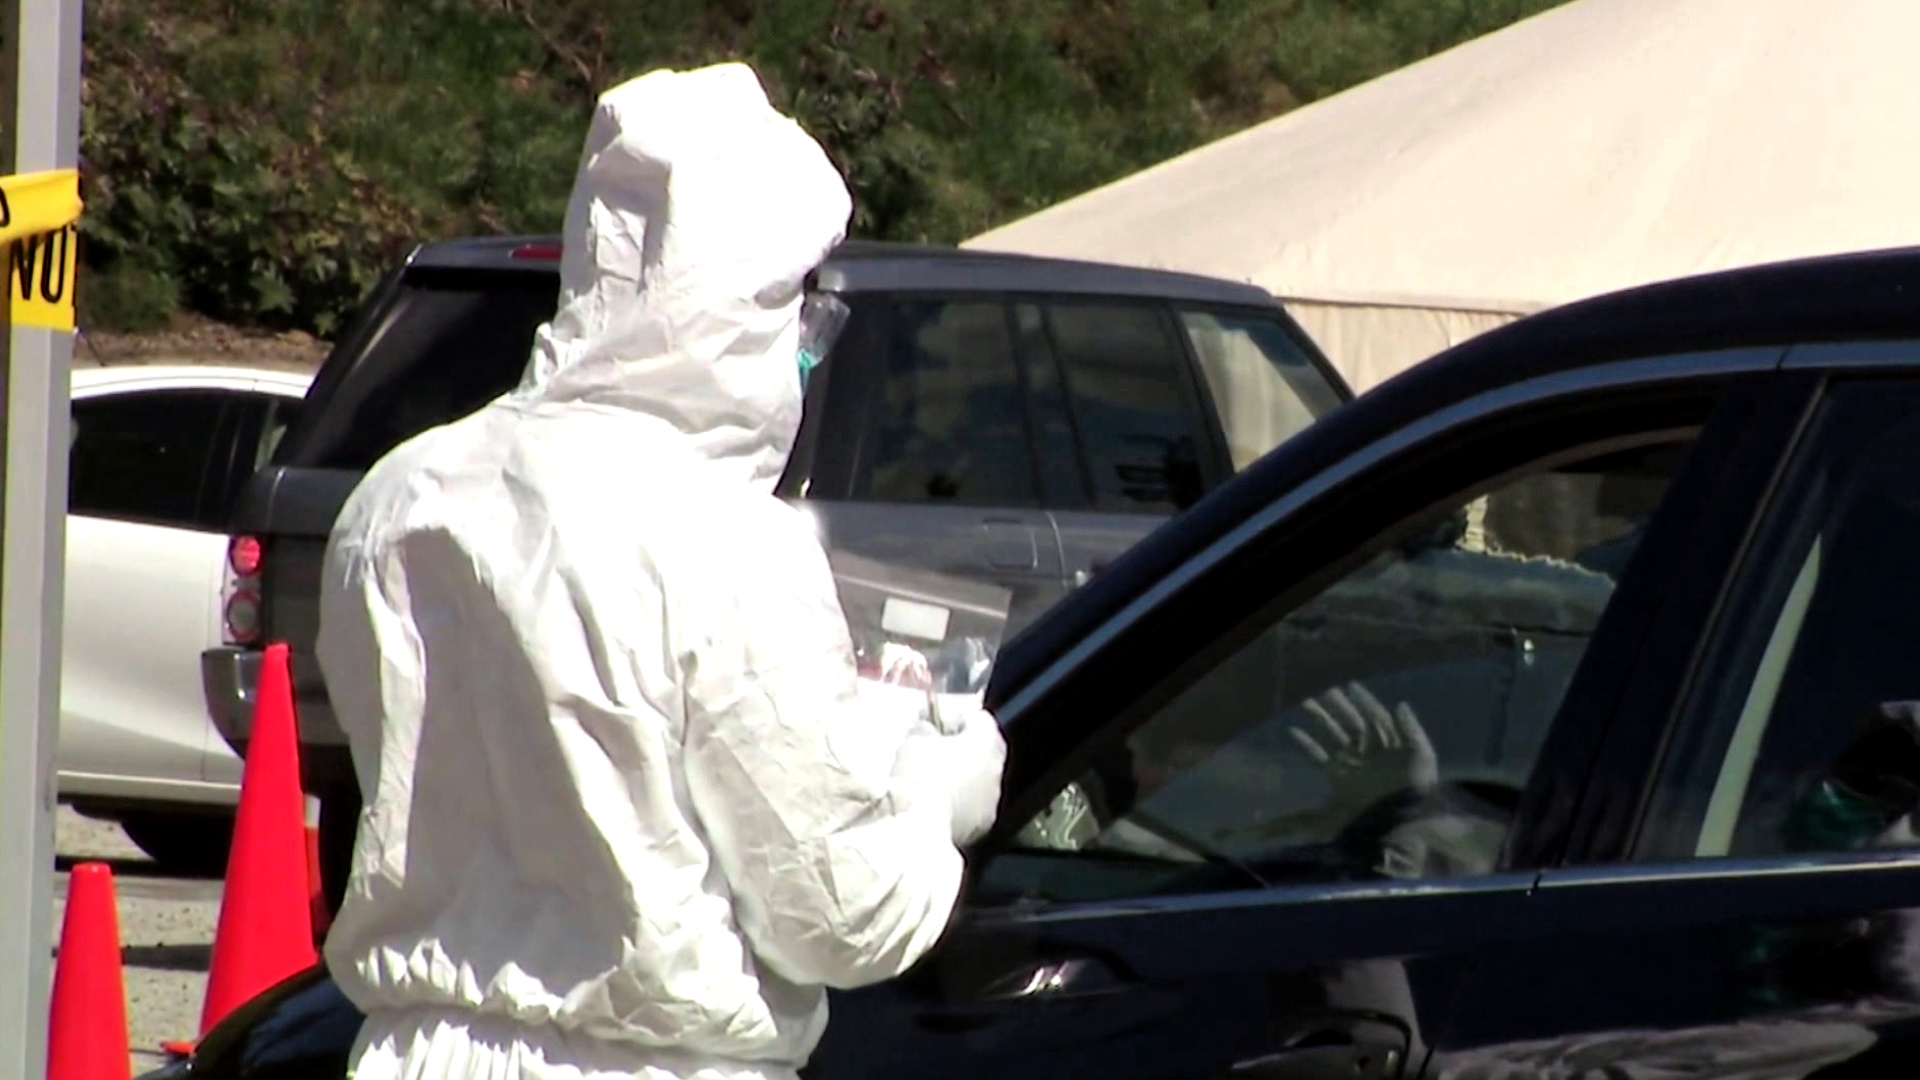 A drive-thru coronavirus testing site is seen outside Dodger Stadium on March 27, 2020. (KTLA)